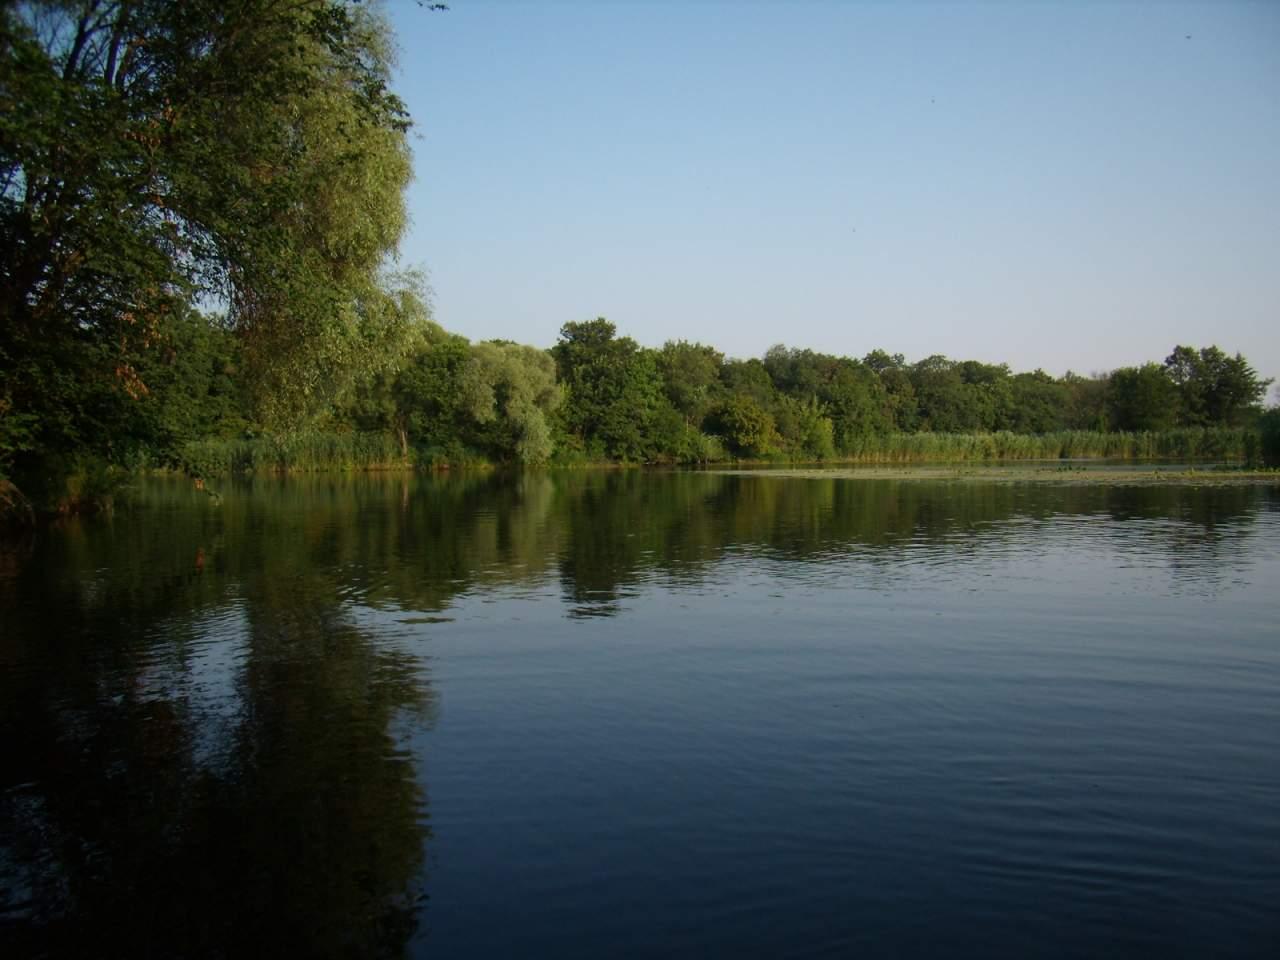 Тело погибшей харьковчанки было обнаружено на берегу реки Северский Донец